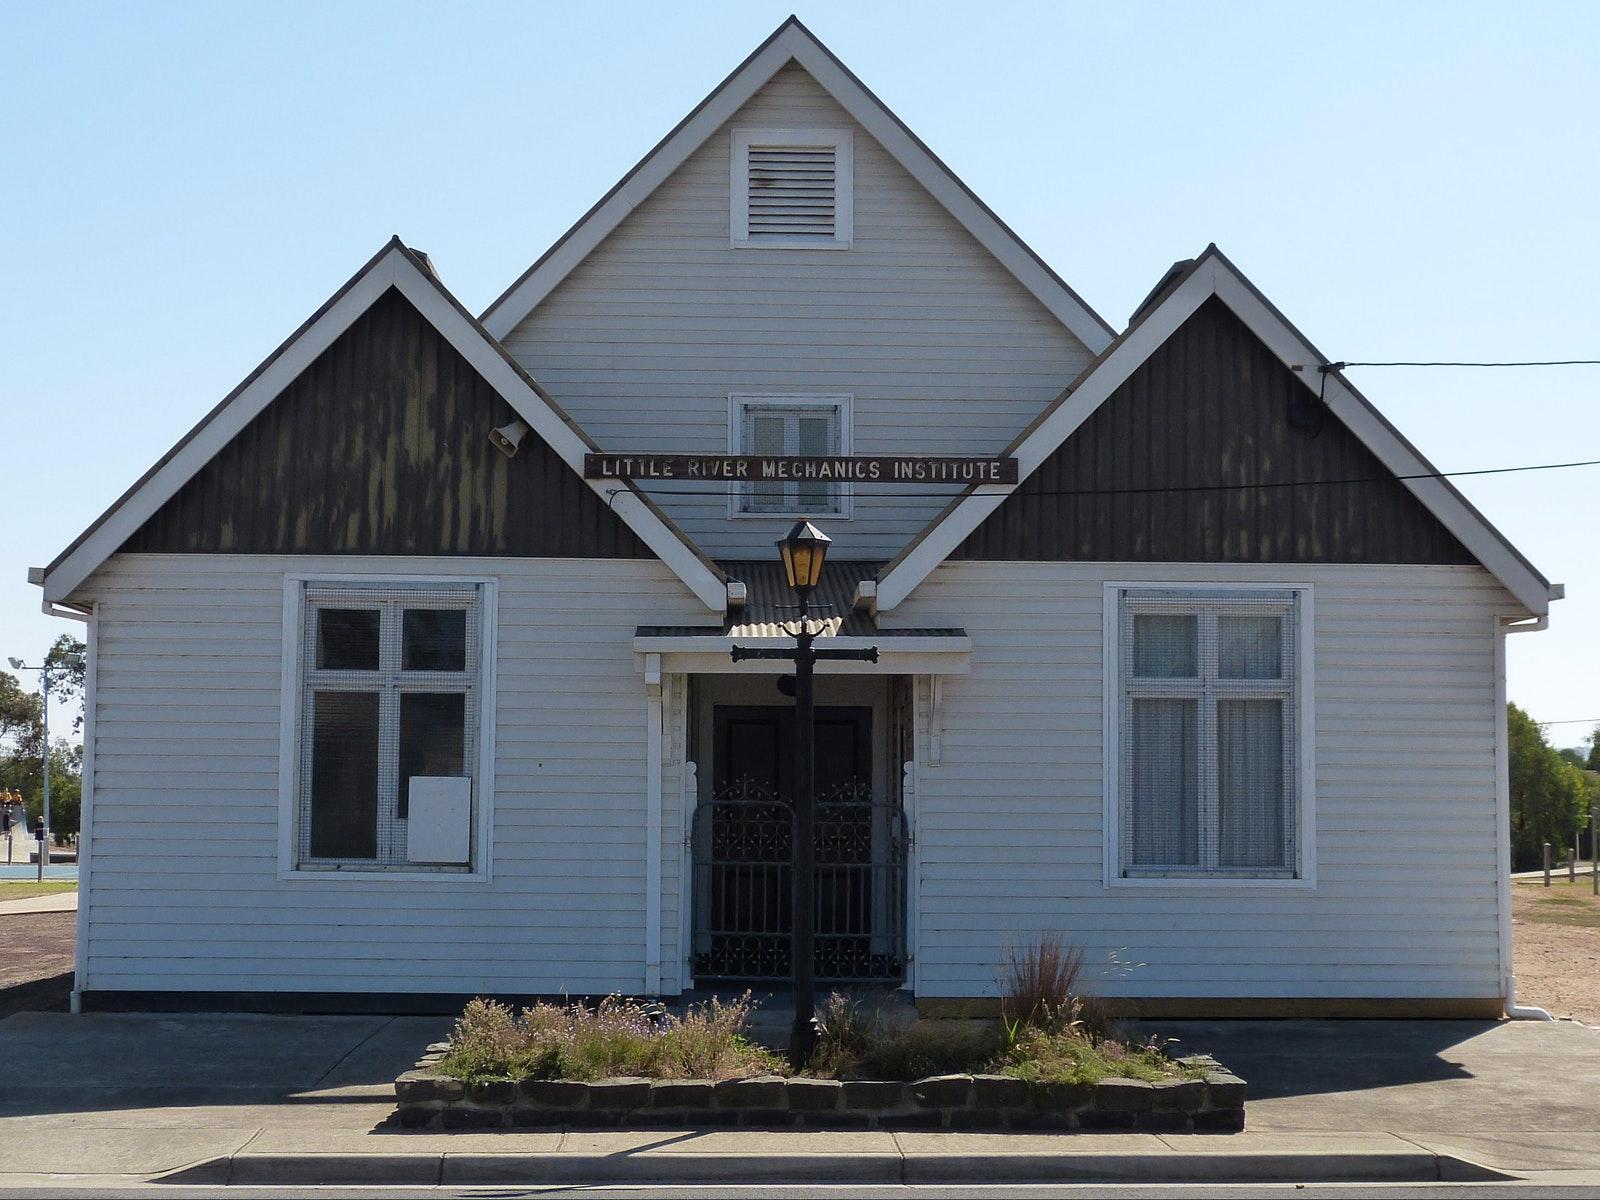 The Little River Mechanics Institute